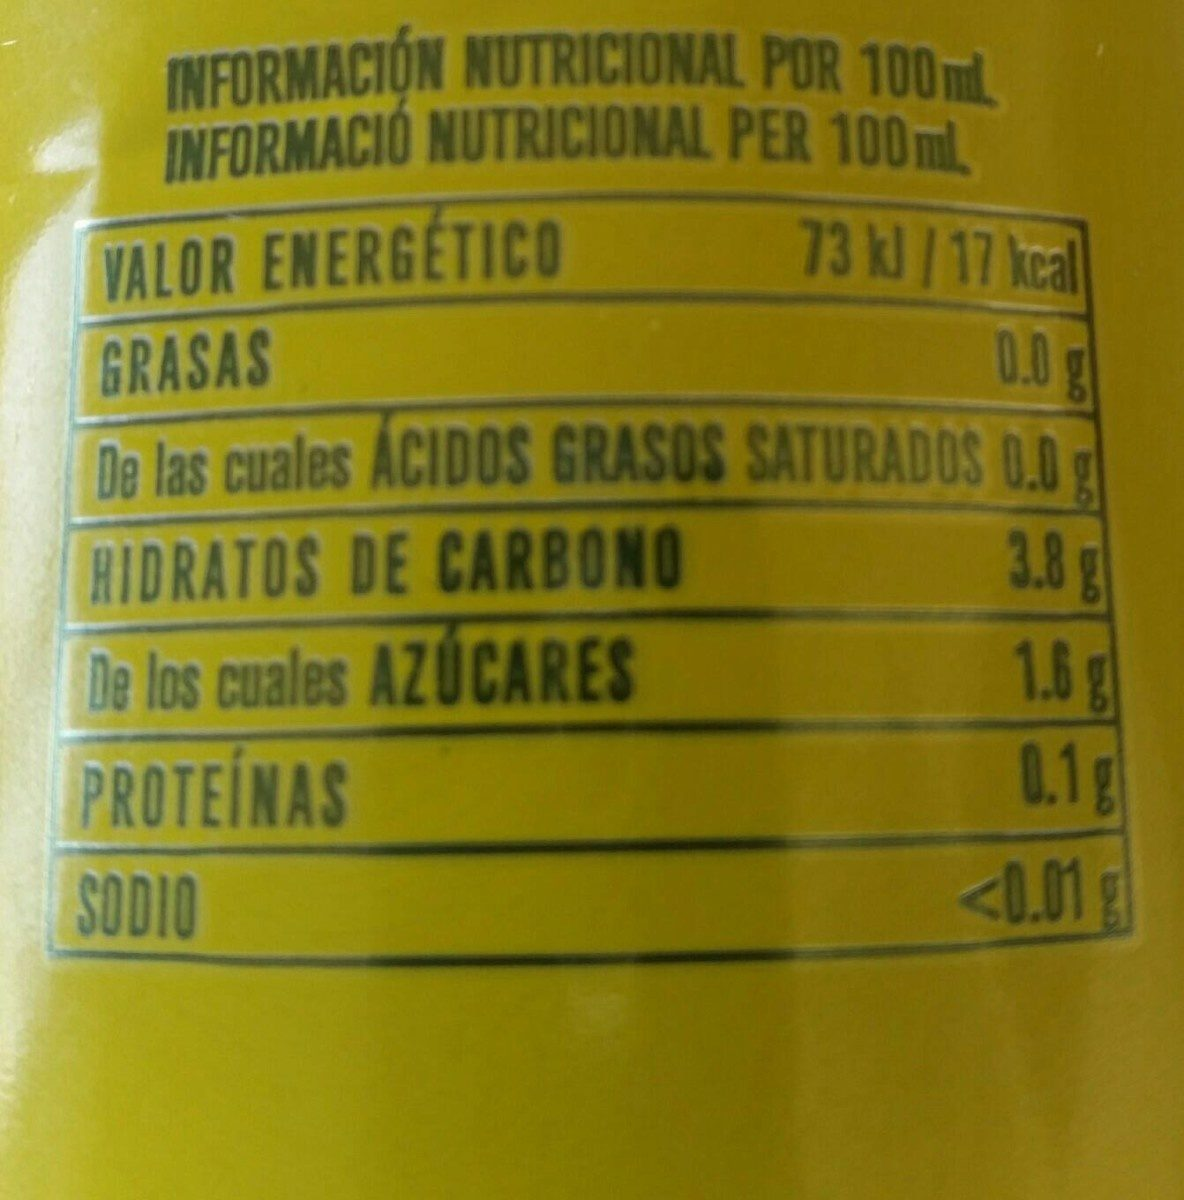 Free Cerveza Sin Alcohol Sabor Limón - Informations nutritionnelles - fr